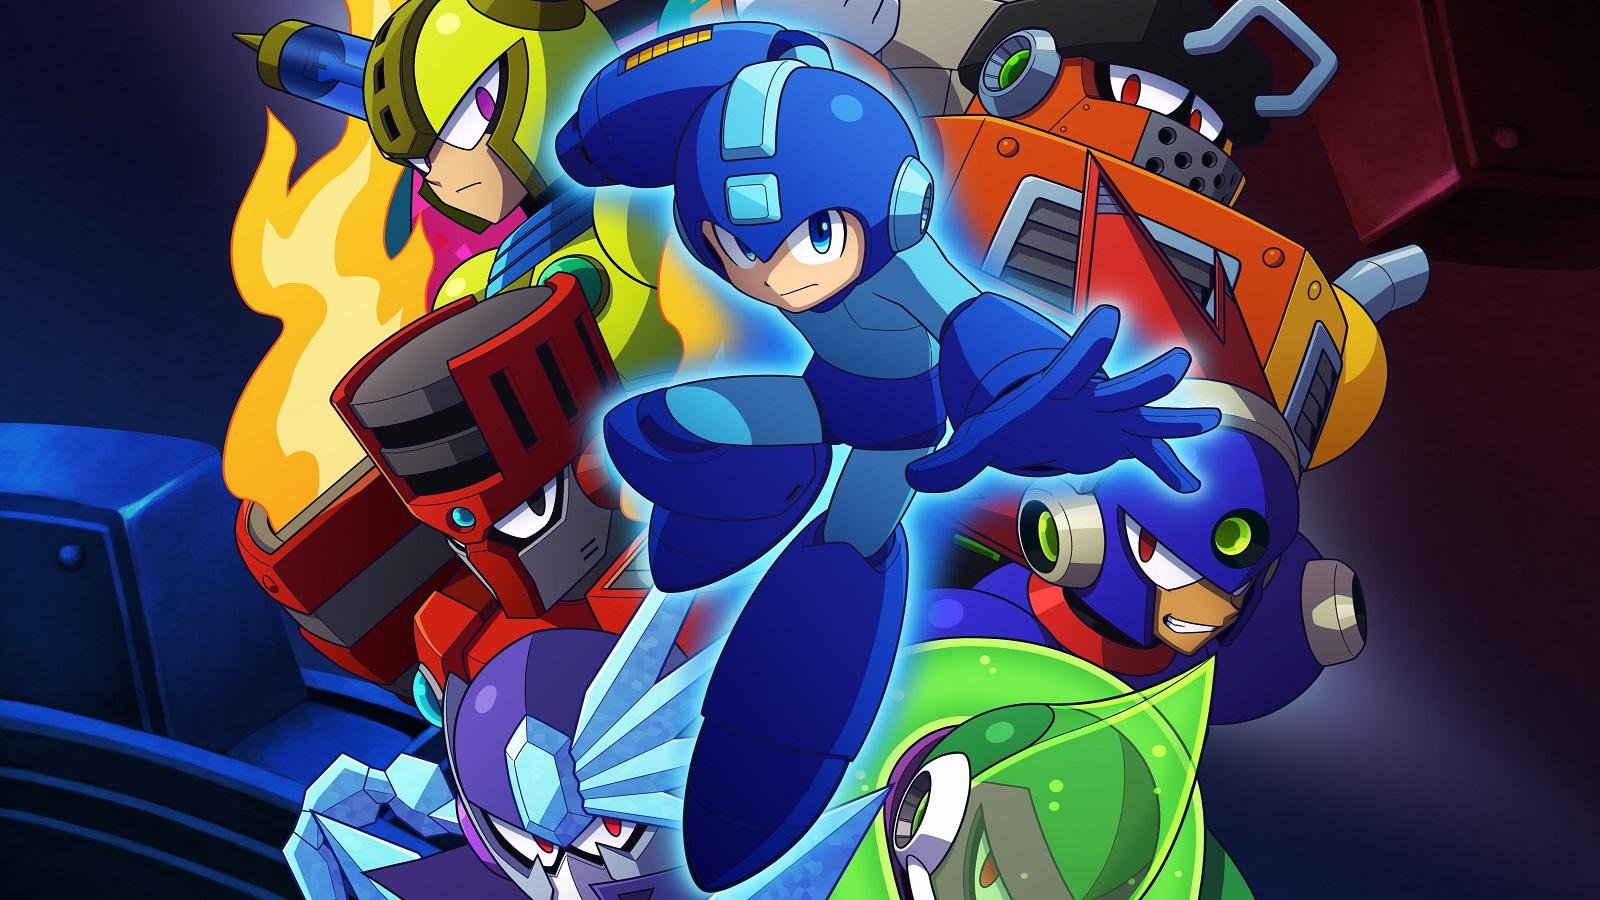 Capcom developing next major Mega Man game